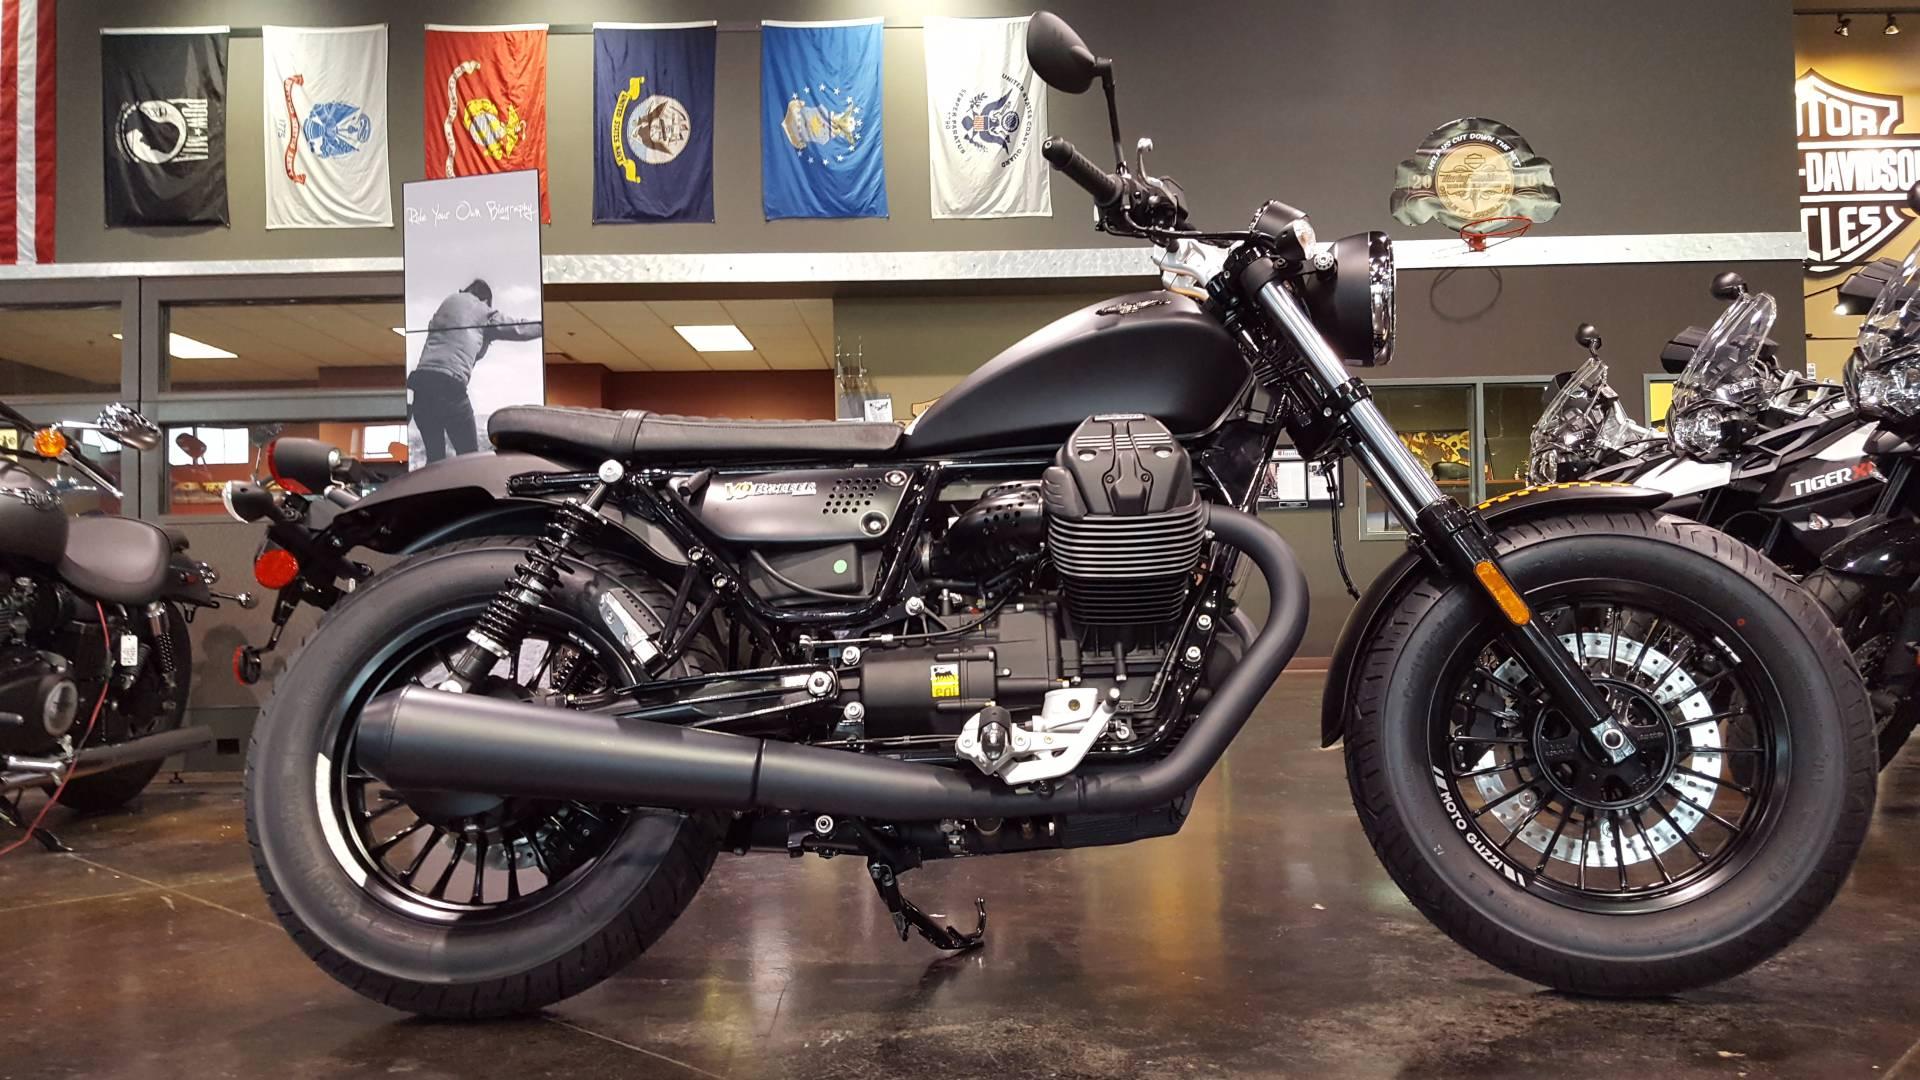 2017 moto guzzi v9 bobber motorcycles saint charles illinois